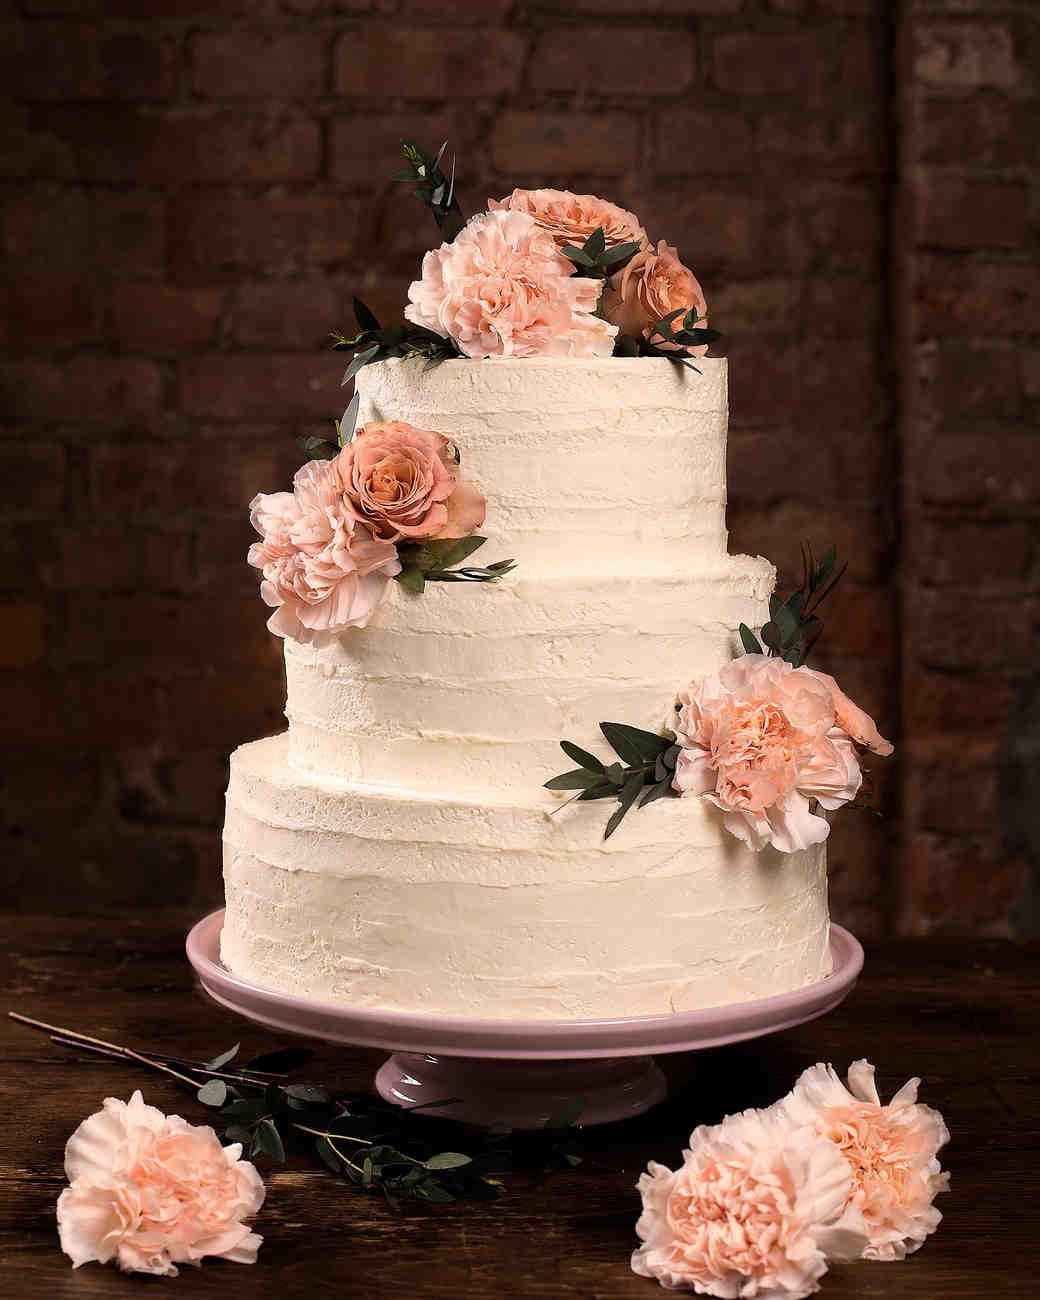 Wedding Cakes Ice Cream  14 Mouthwatering Ways to Serve Ice Cream at Your Wedding